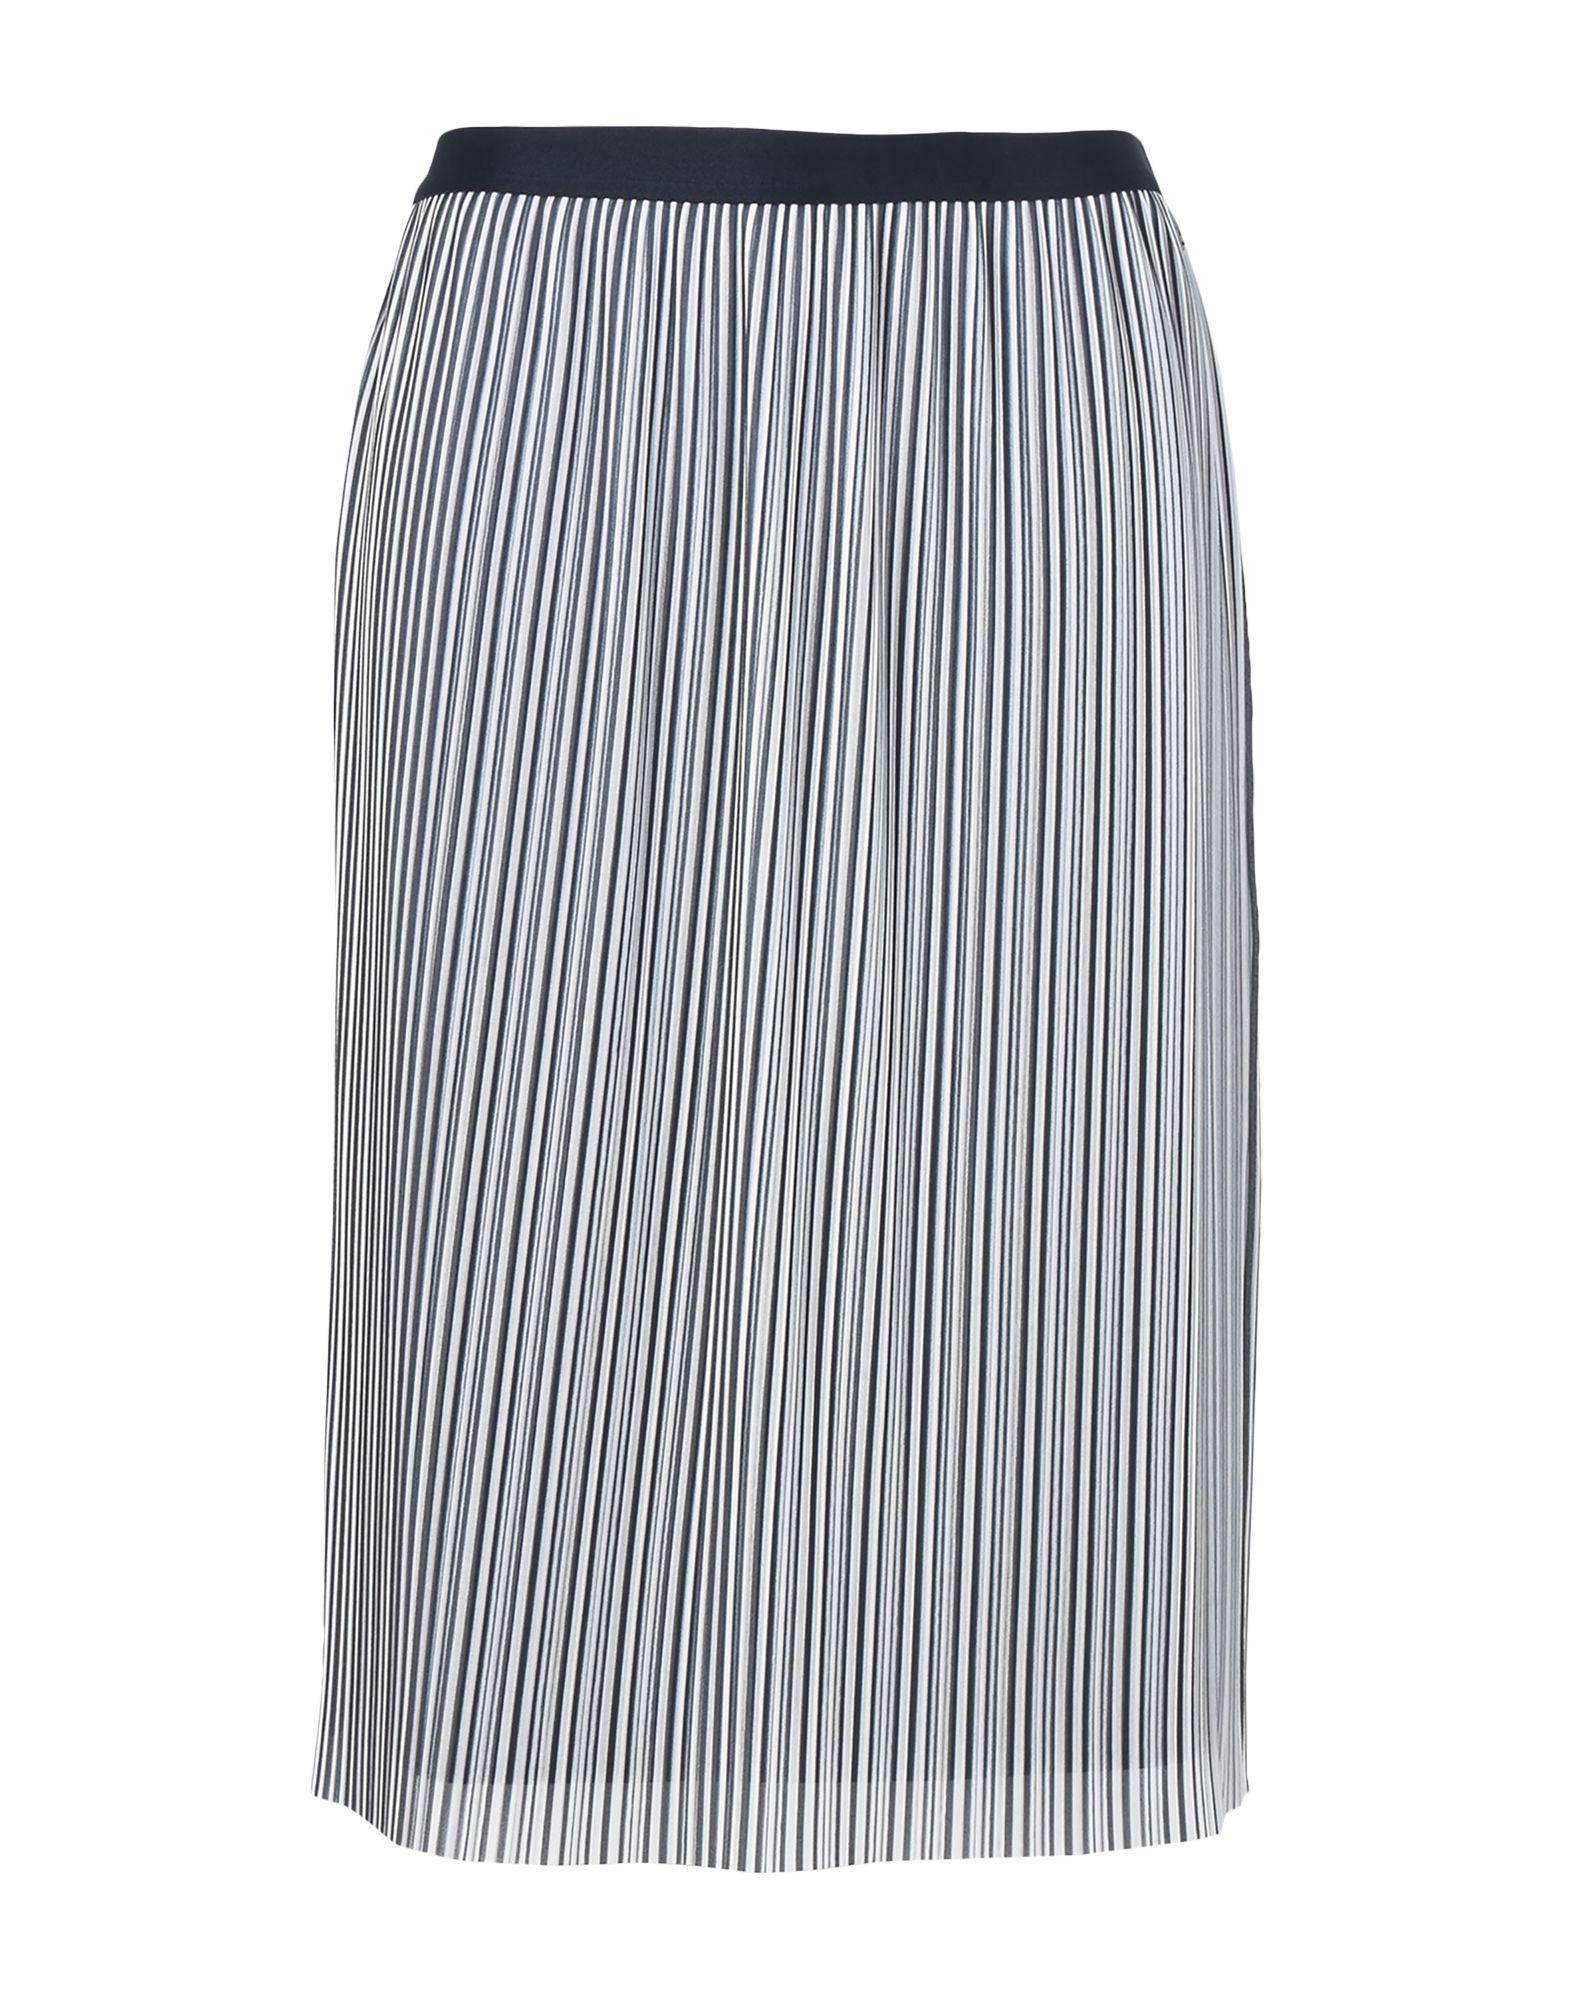 Фото - ARMANI EXCHANGE Юбка длиной 3/4 gold case юбка длиной 3 4